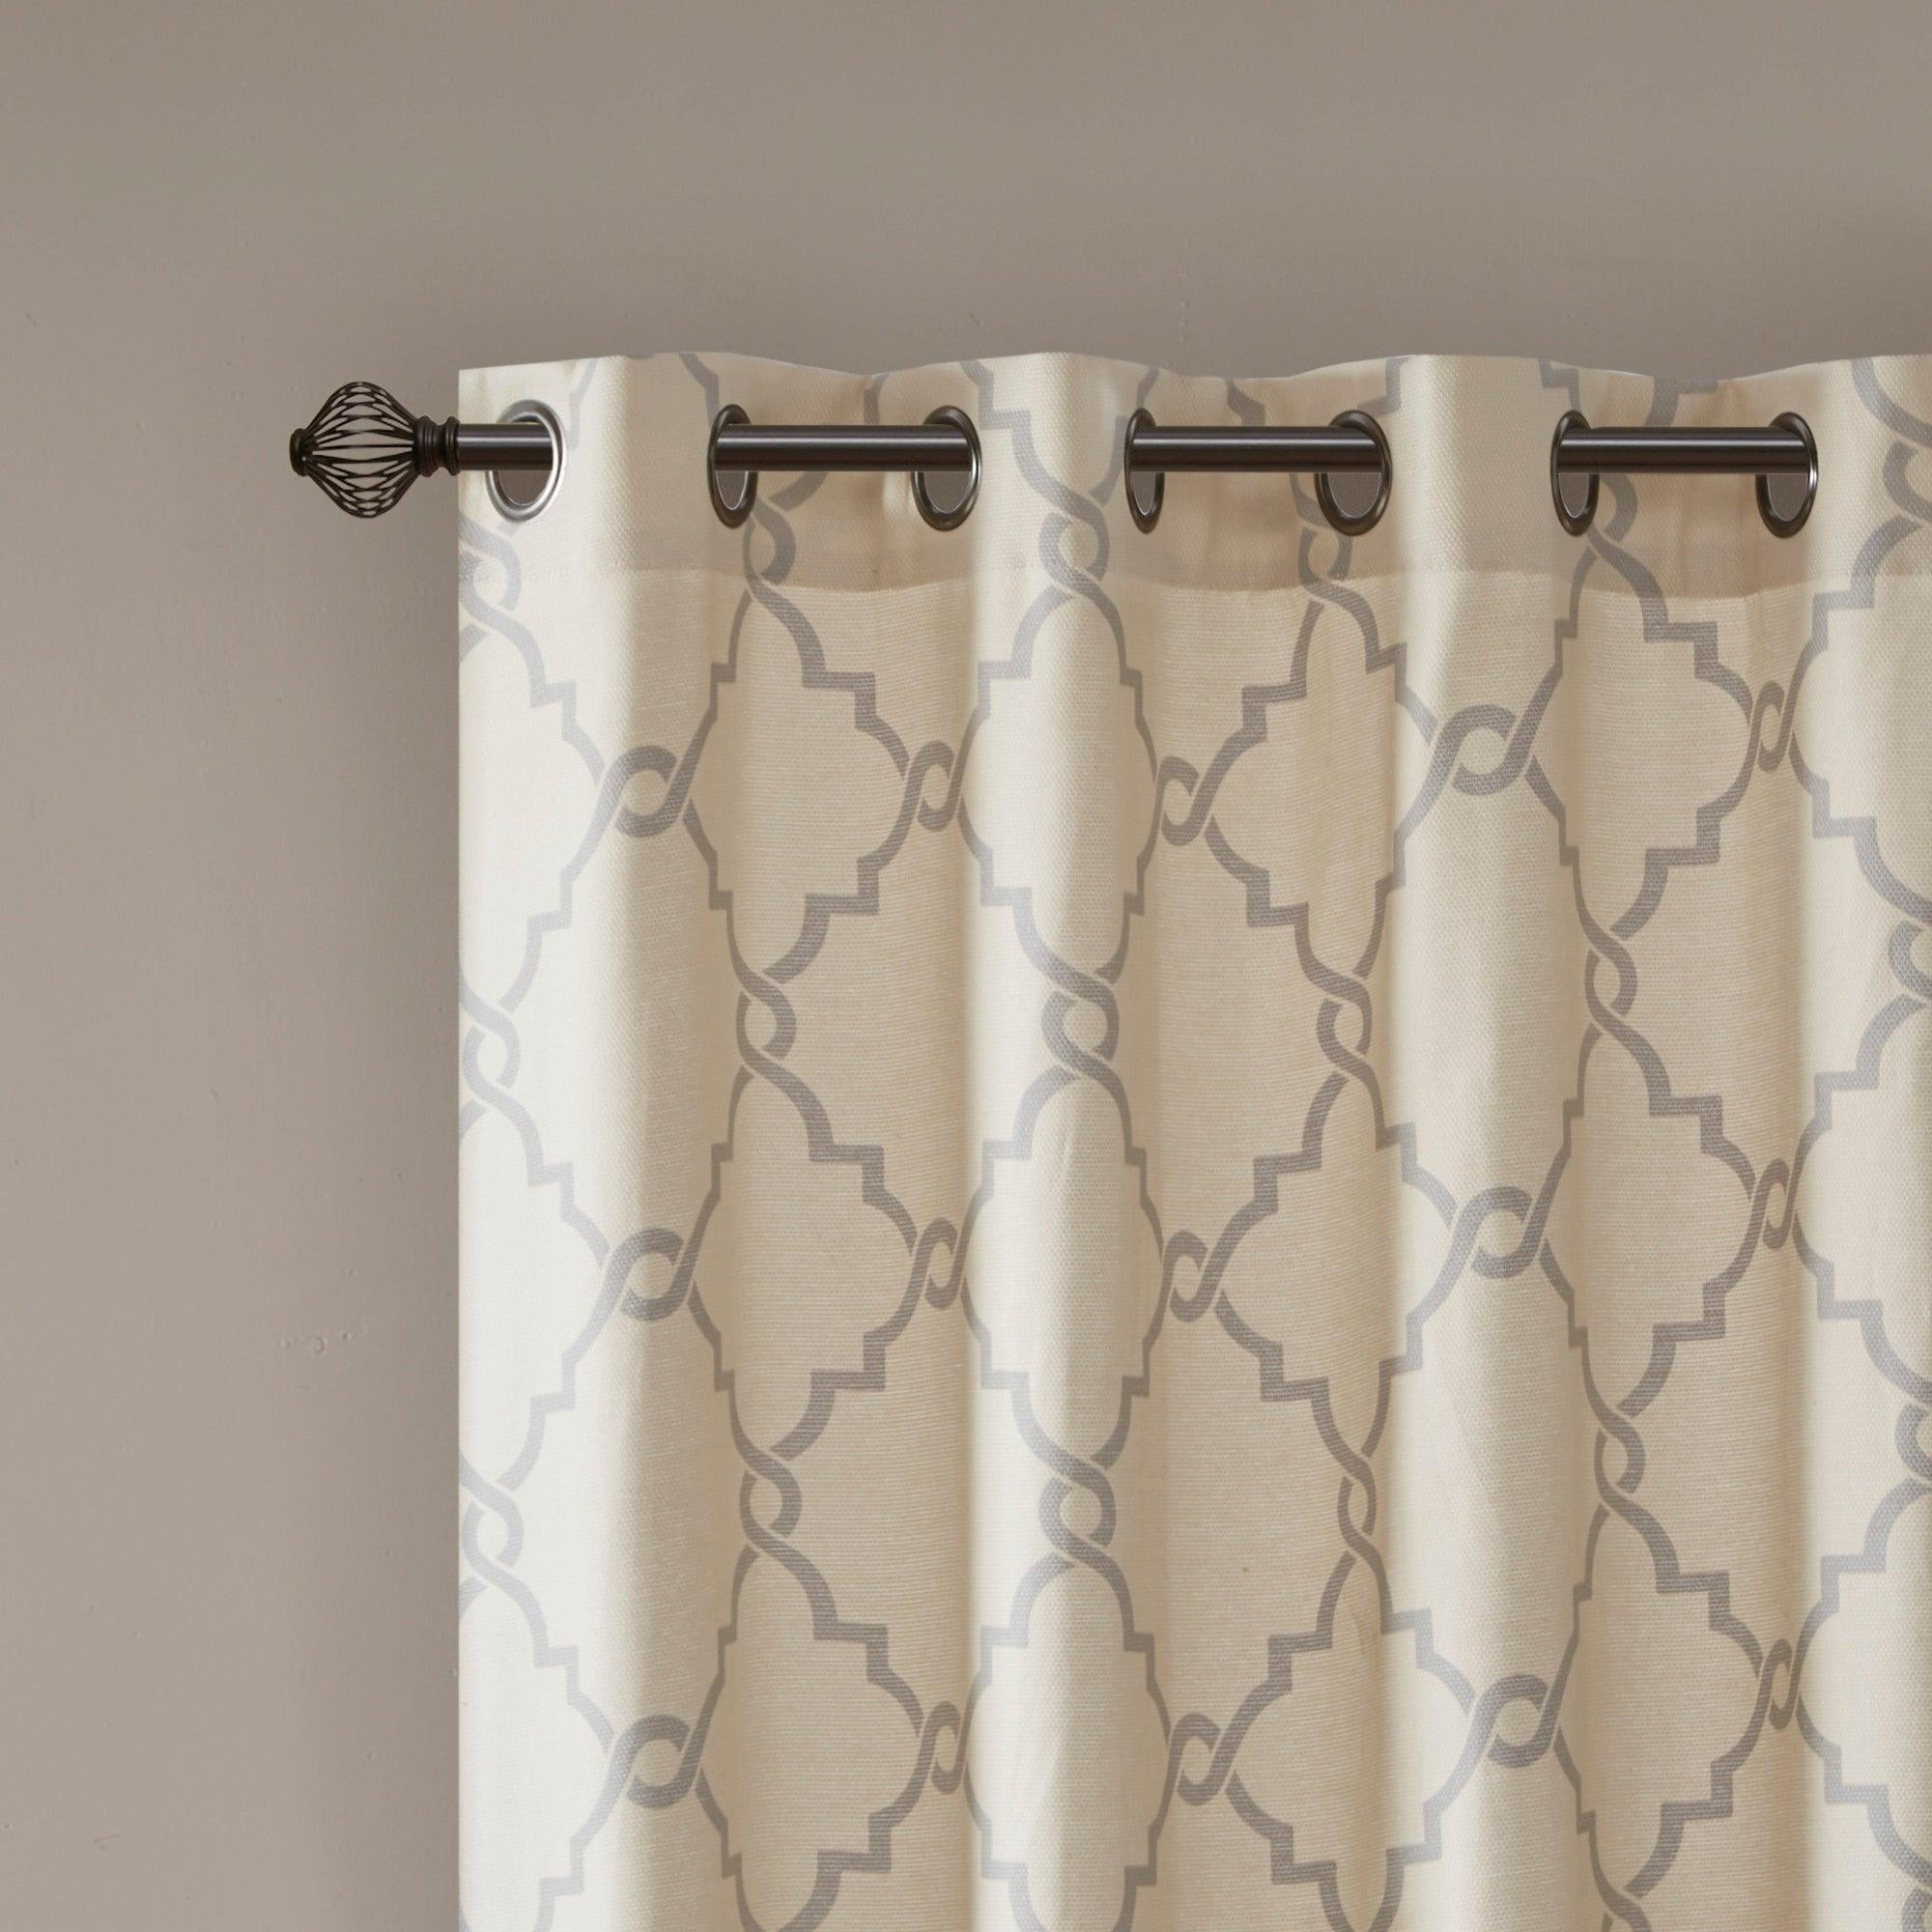 Madison Park Westmont Fretwork Print Pattern Single Curtain Panel Regarding Fretwork Print Pattern Single Curtain Panels (View 4 of 20)